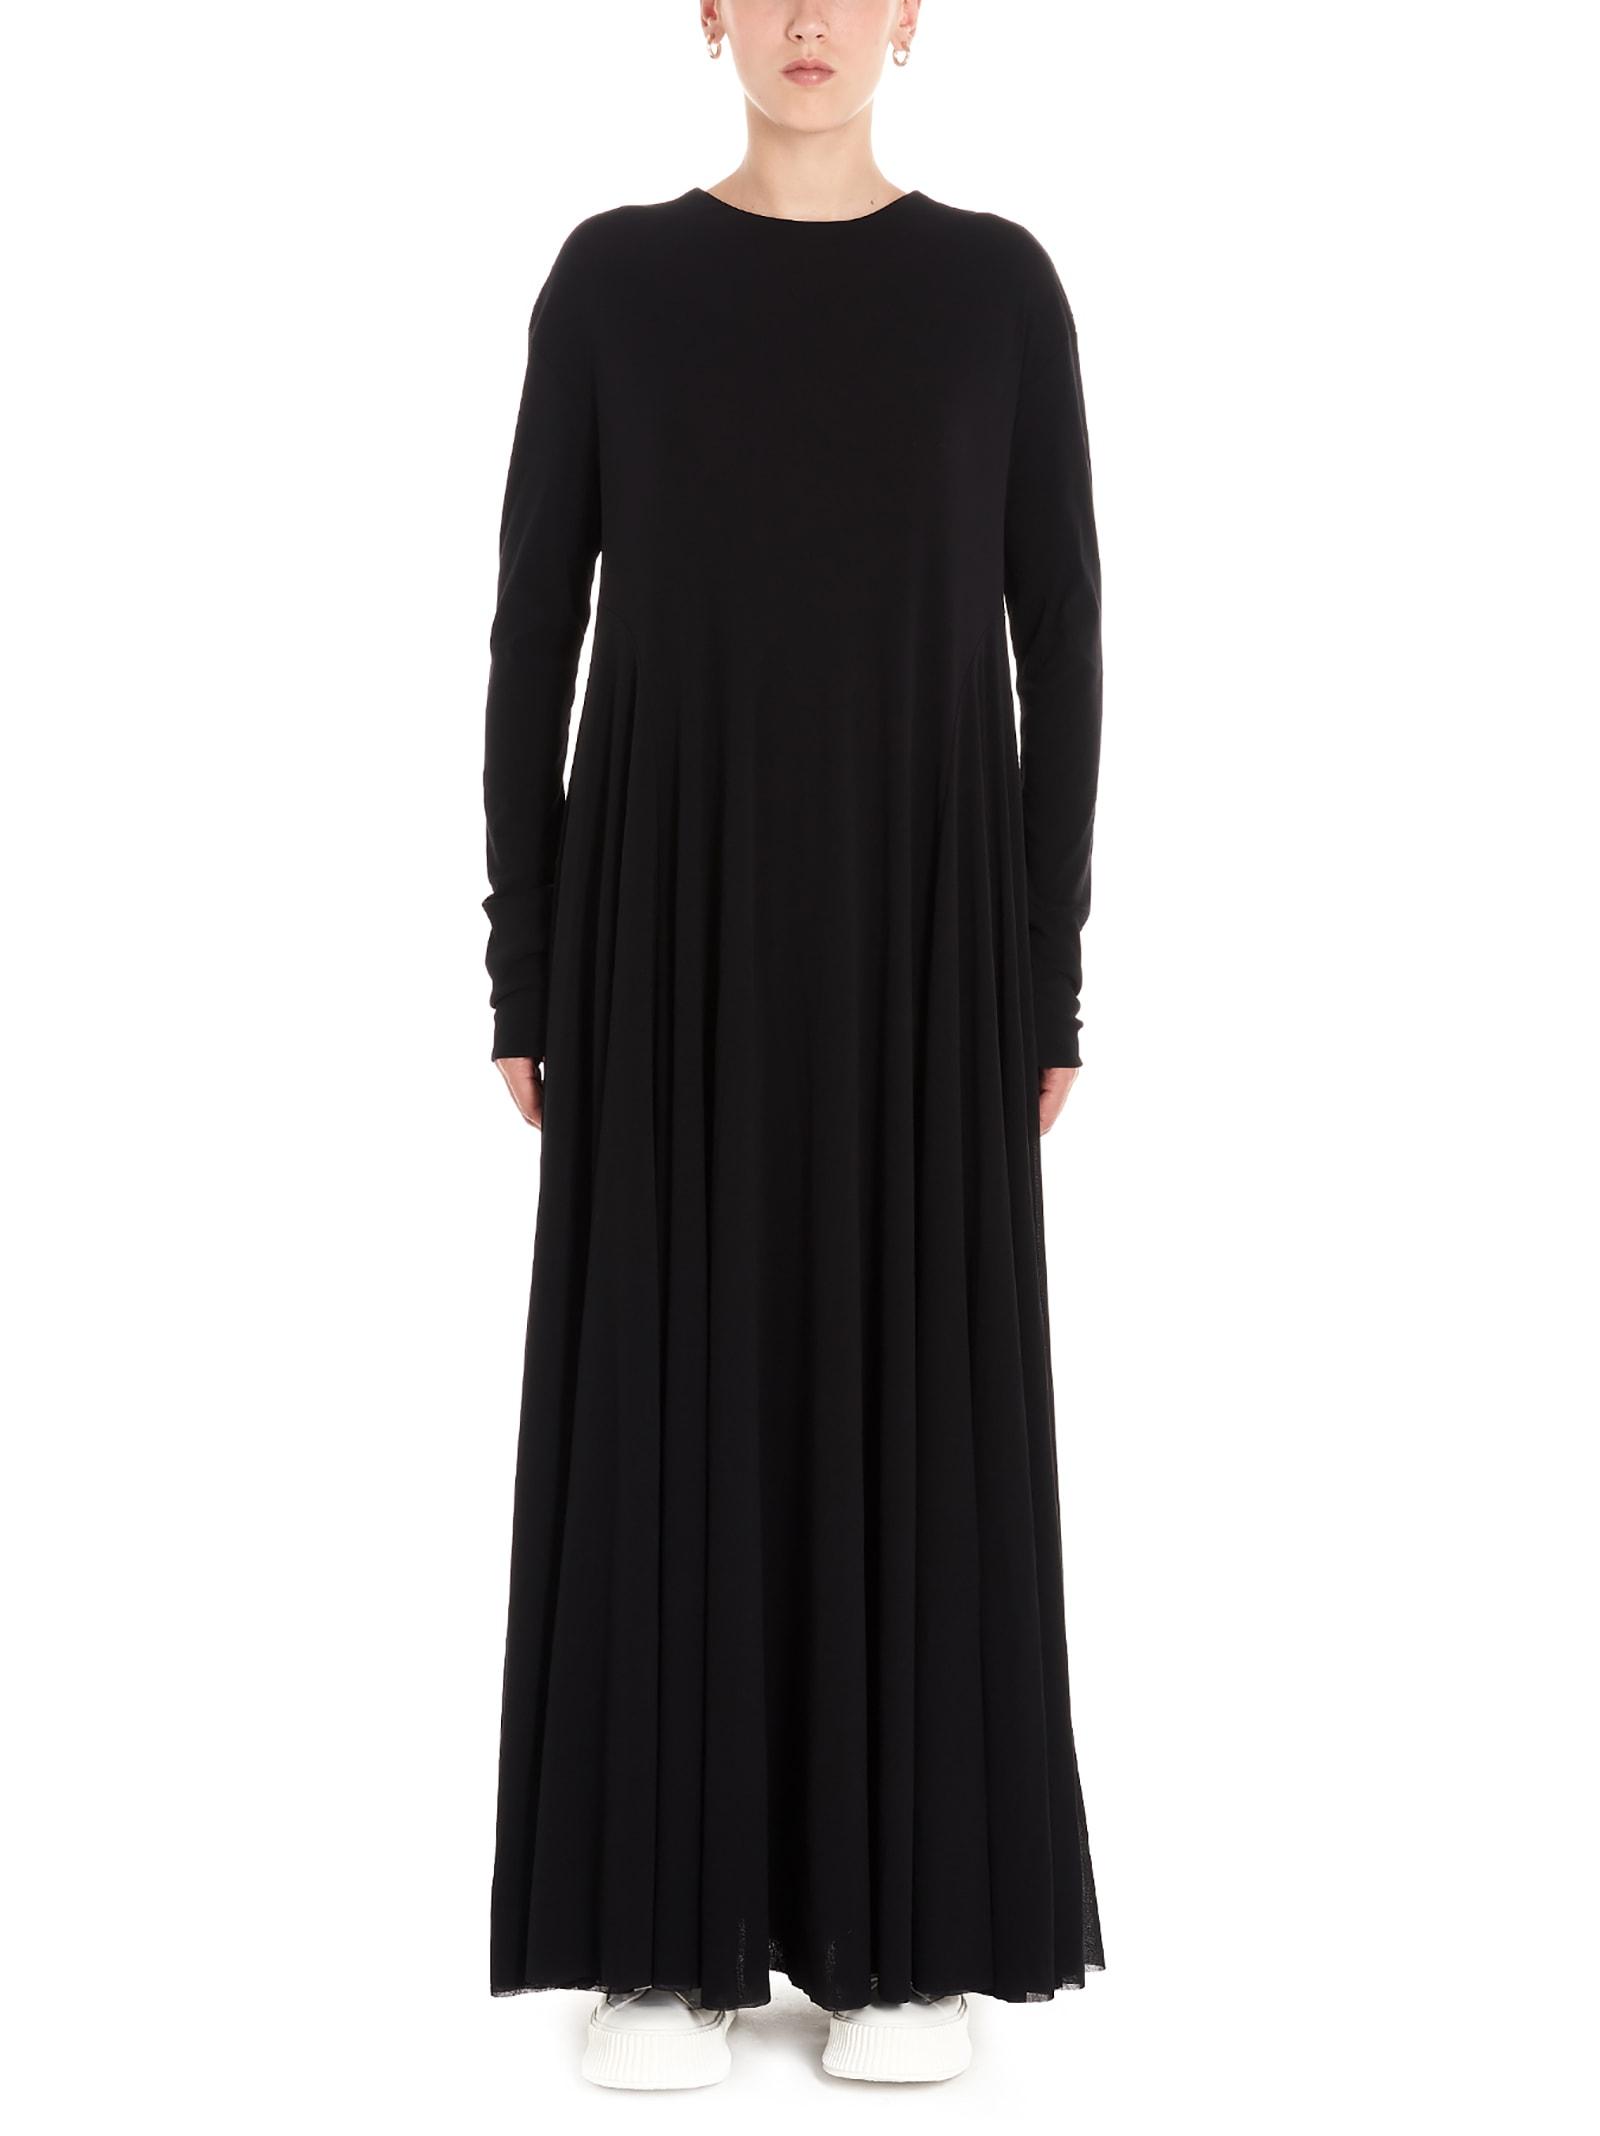 Jil Sander dress Dress